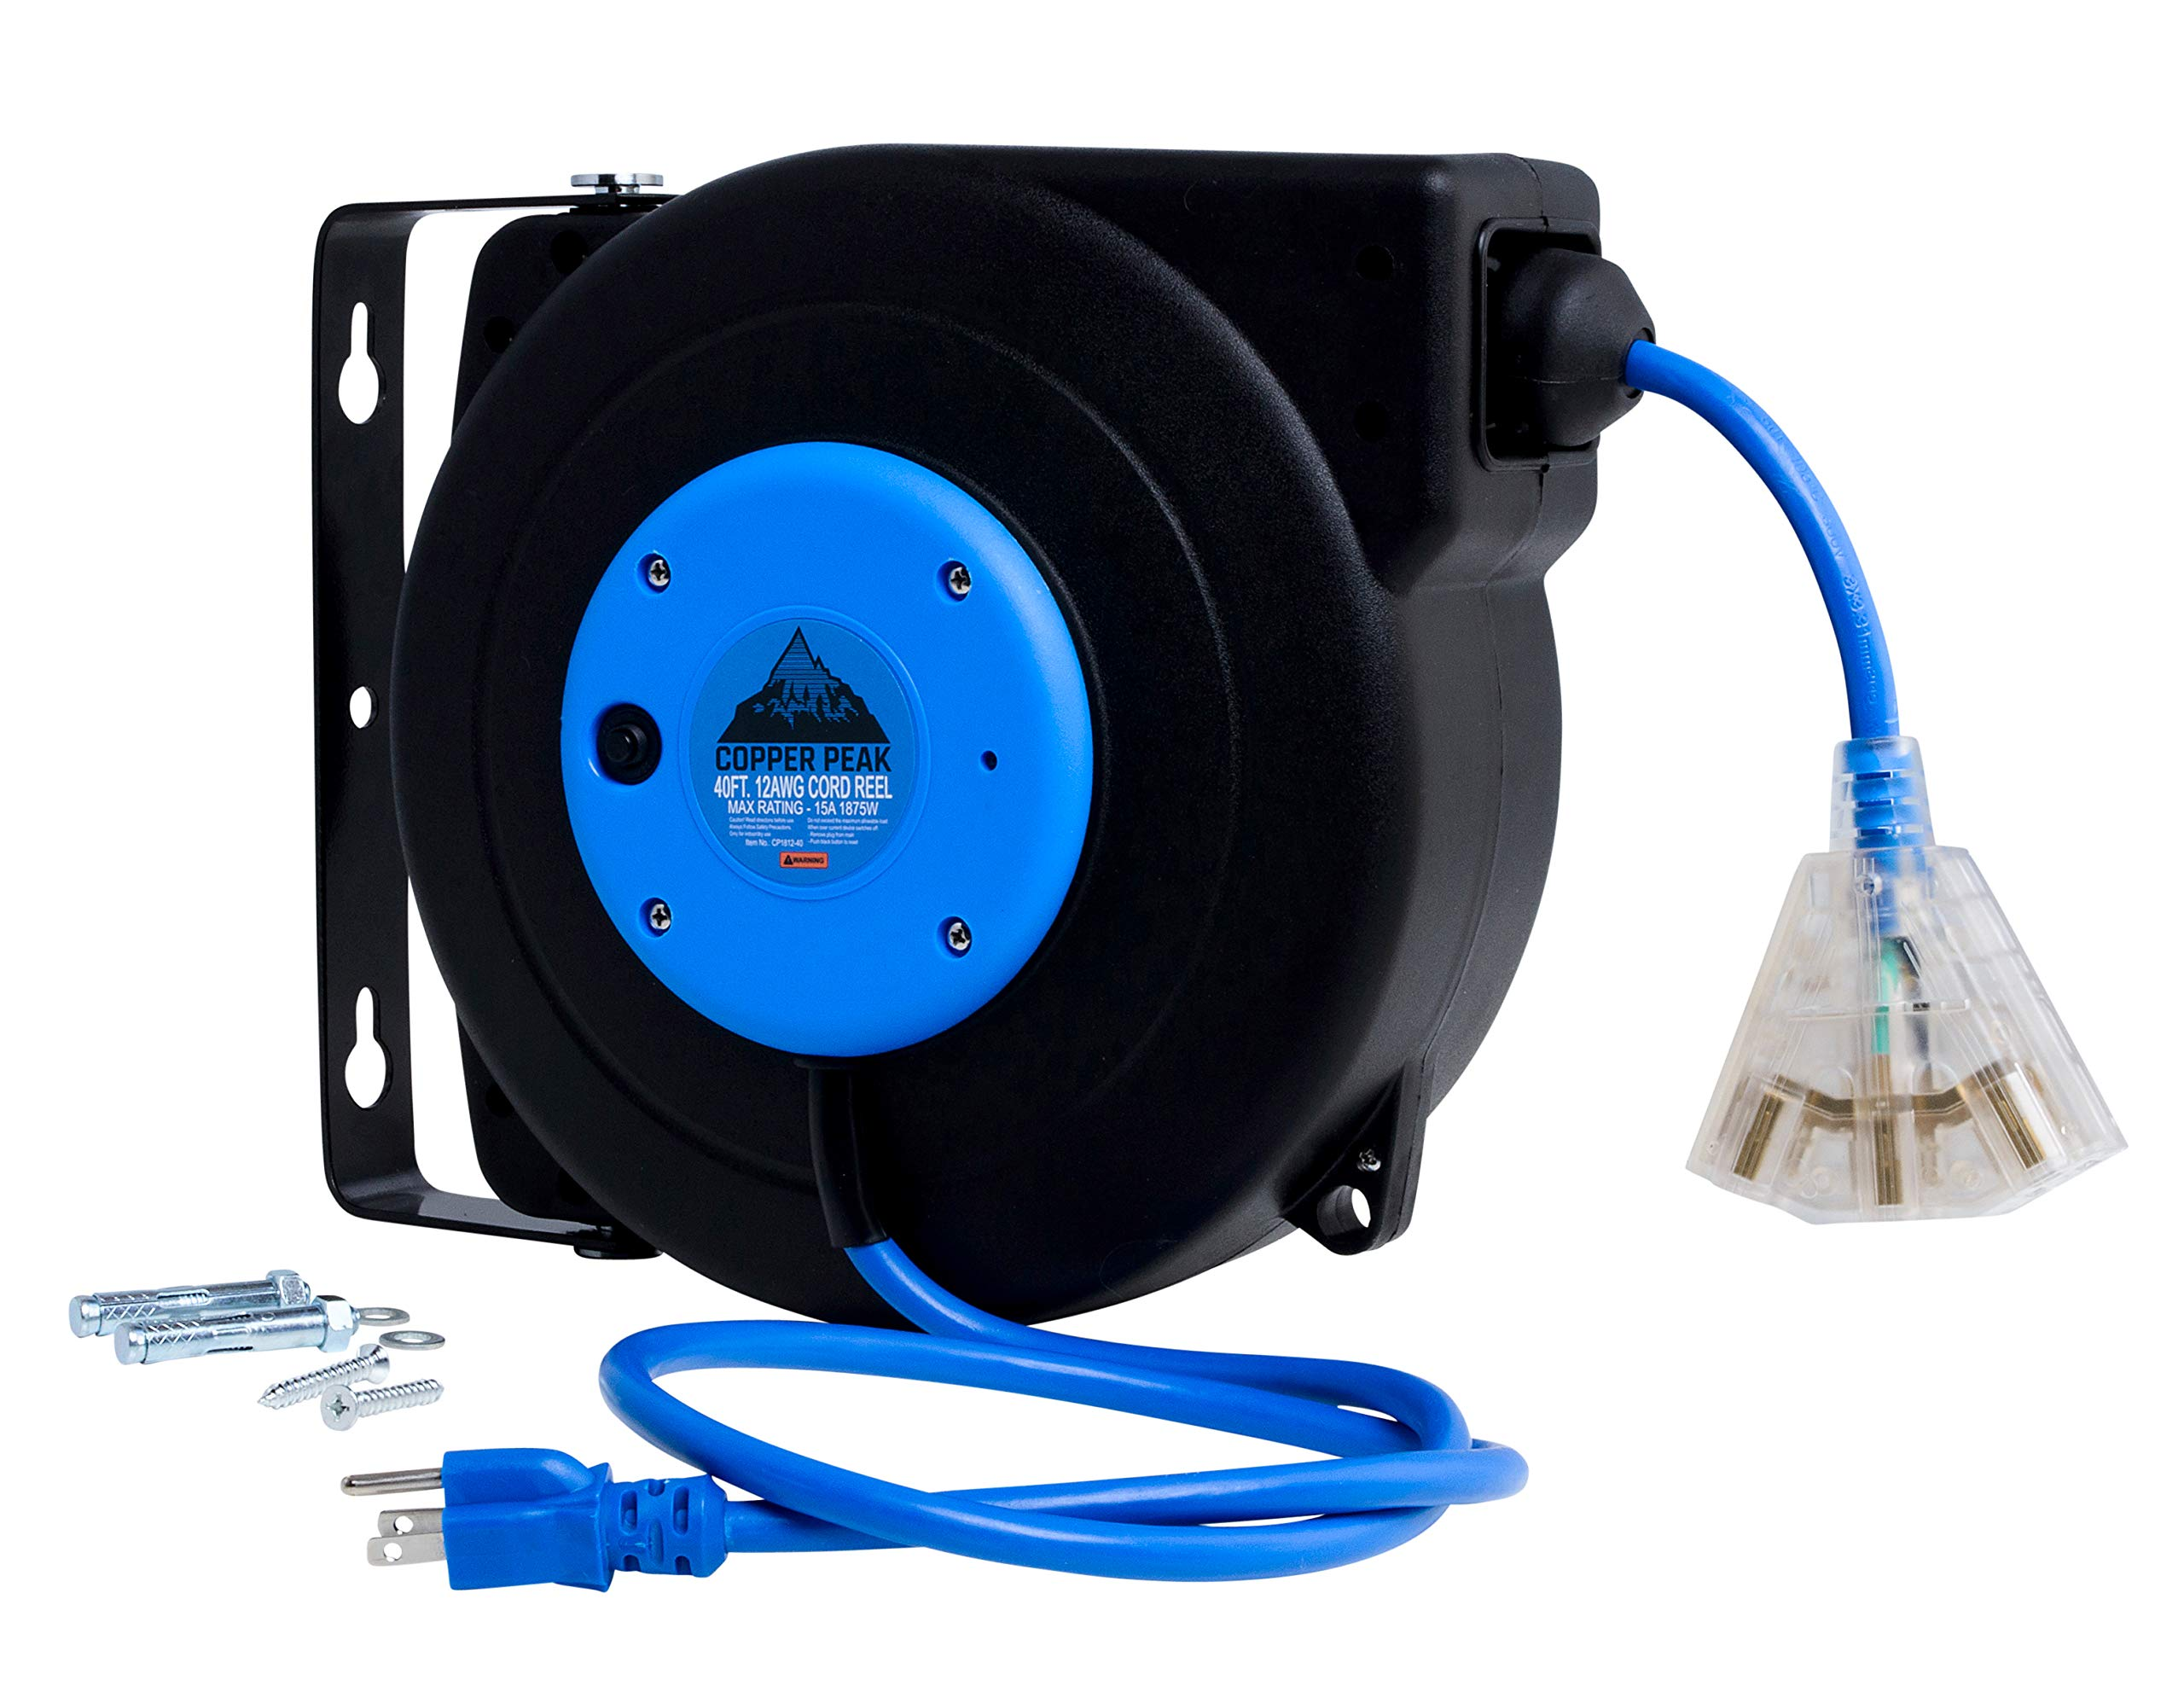 CopperPeak 40 Foot Retractable Extension Cord Reel - Ceiling or Wall Mount - 12 Gauge - Blue and Black